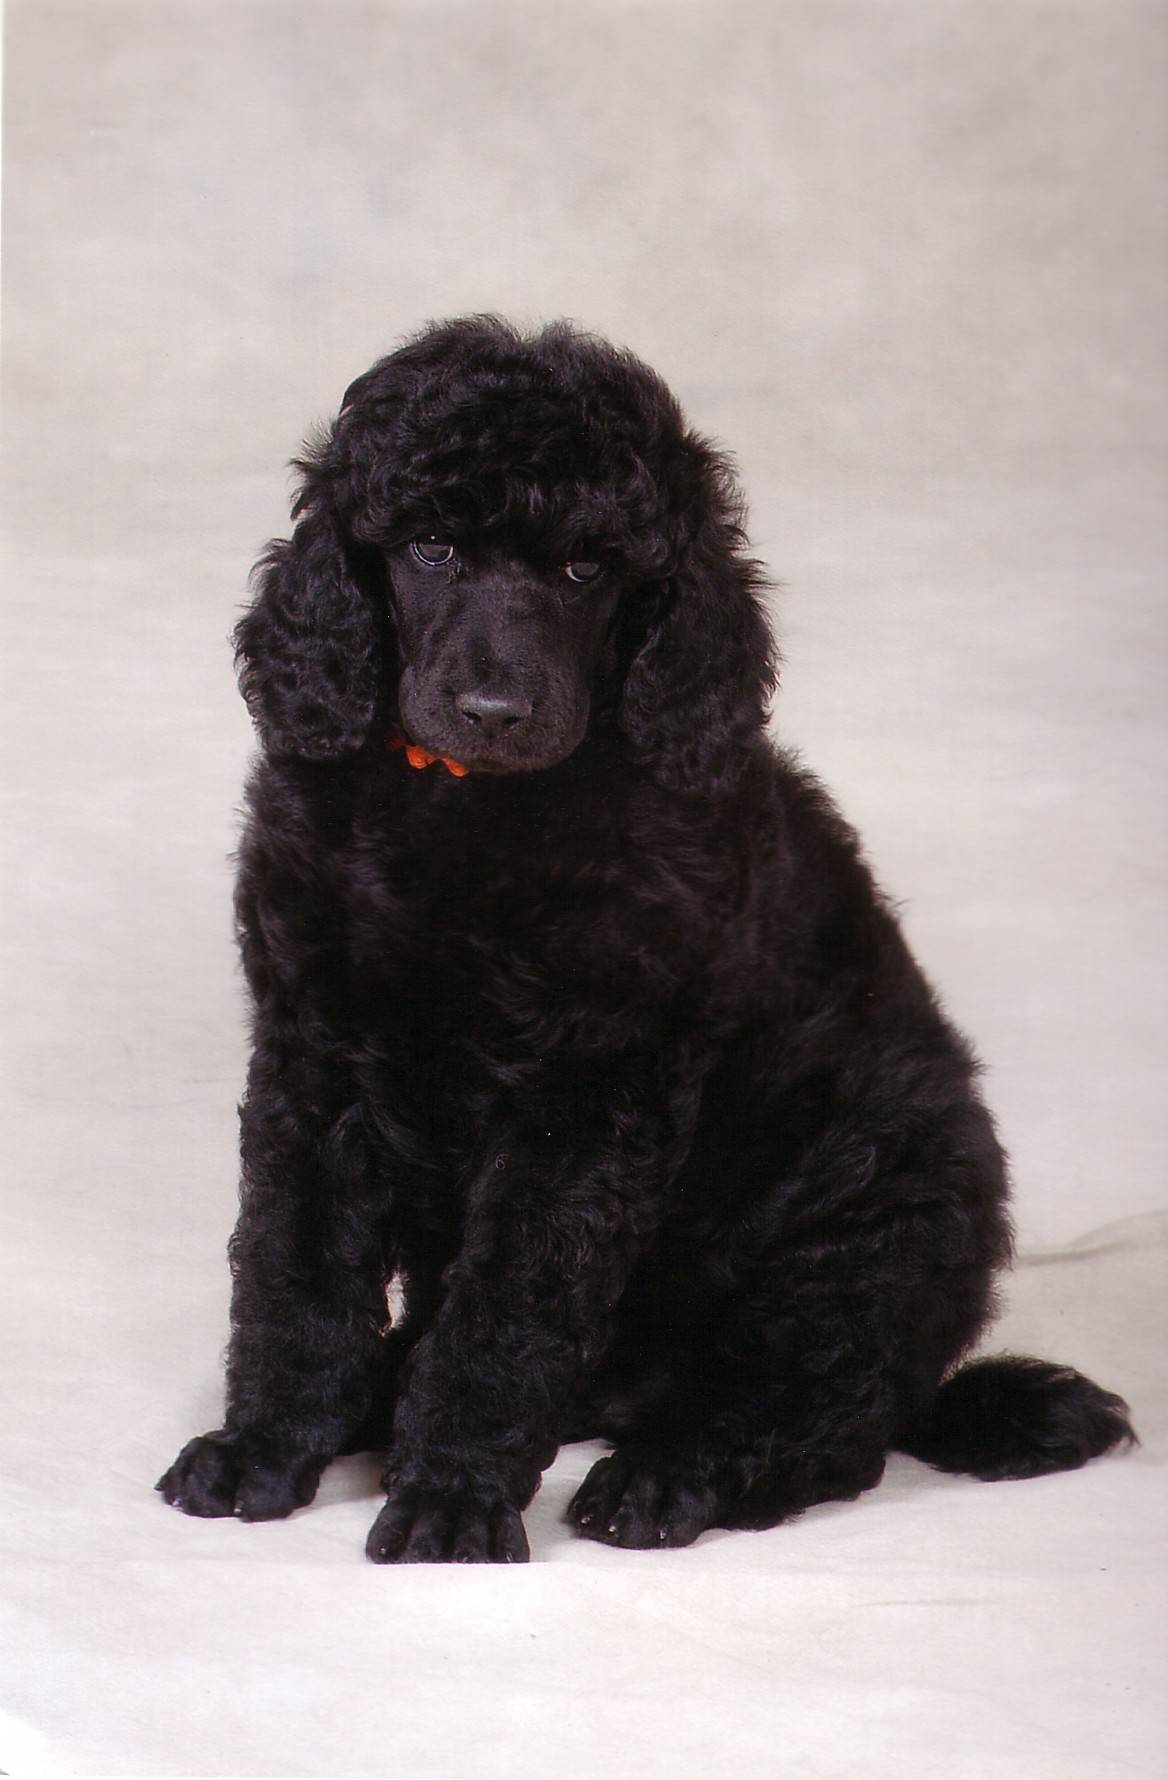 Wilson.  7 weeks old.  Photo taken by Terry Rowe.  http://www.rowepetart.com/